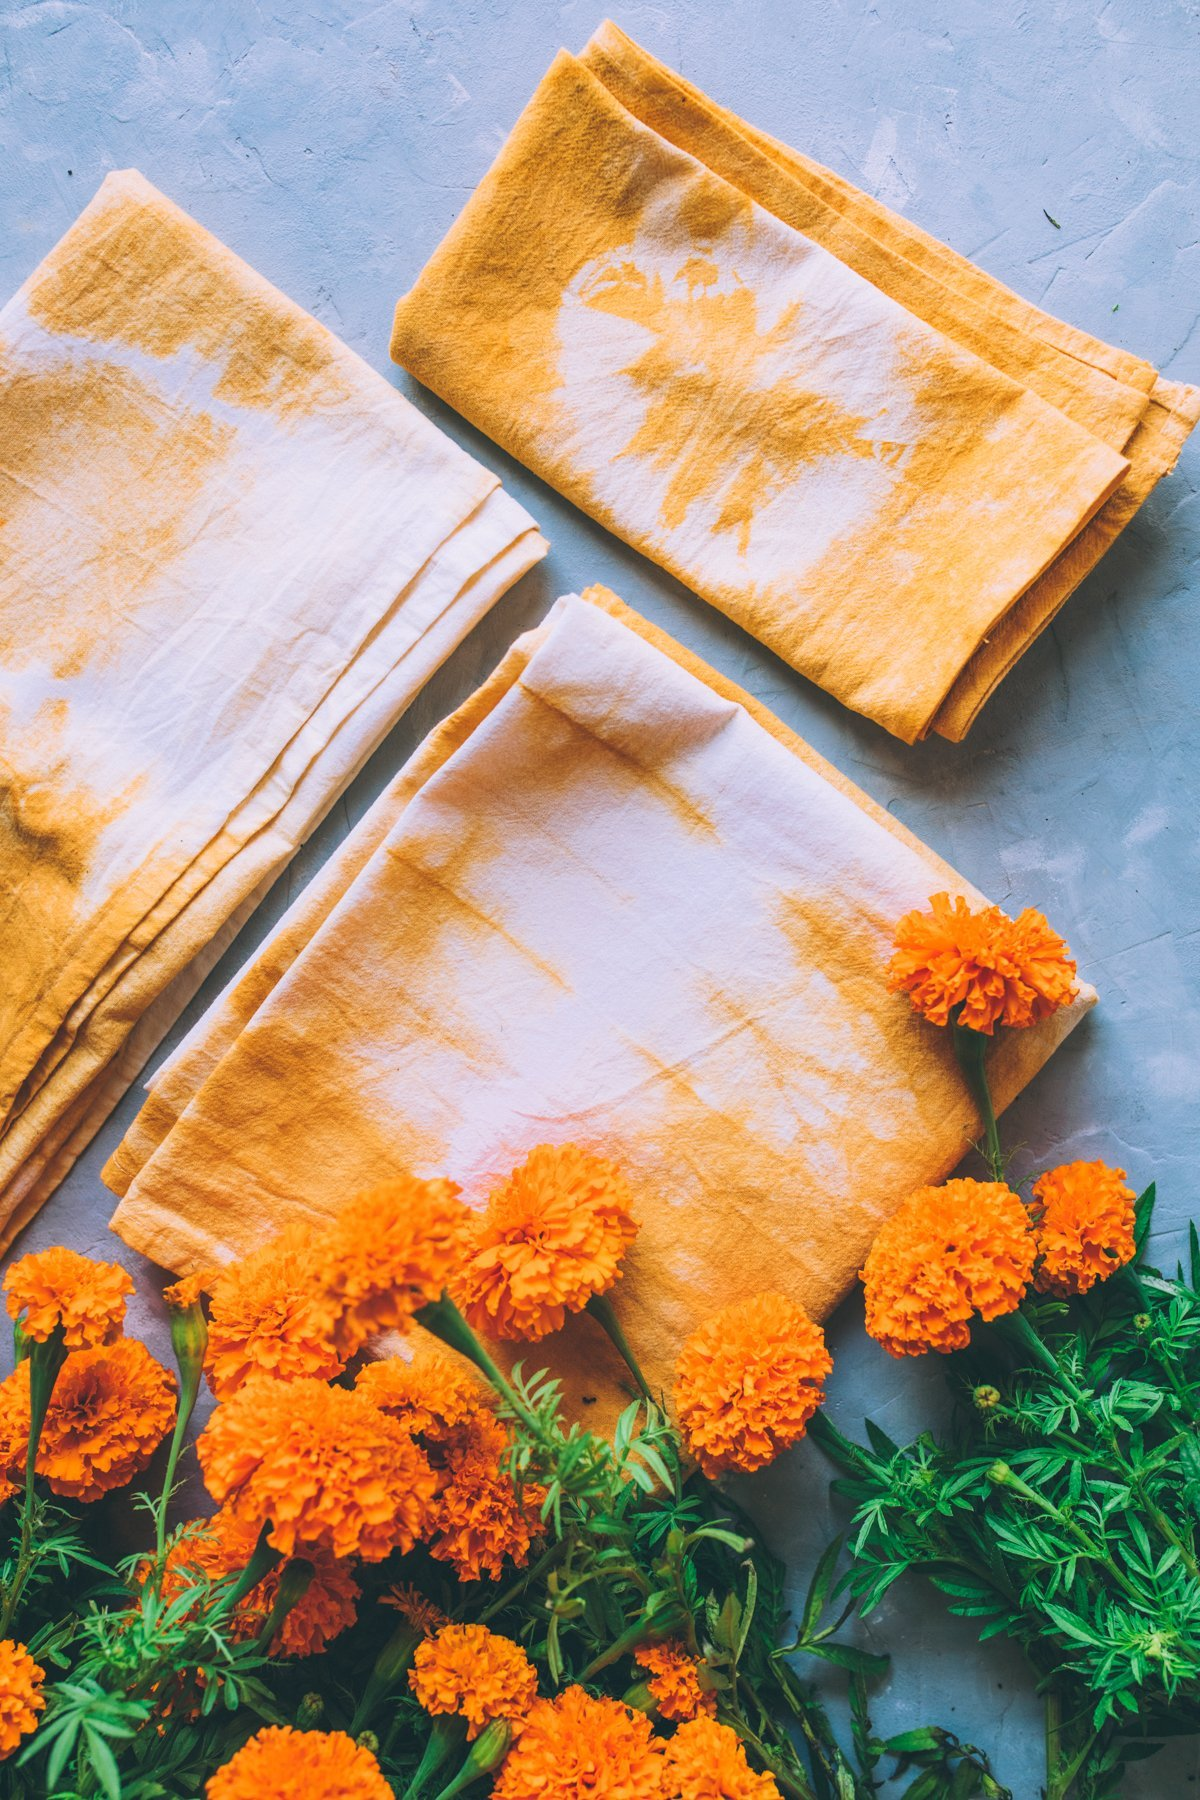 Marigold flowers and tea towels